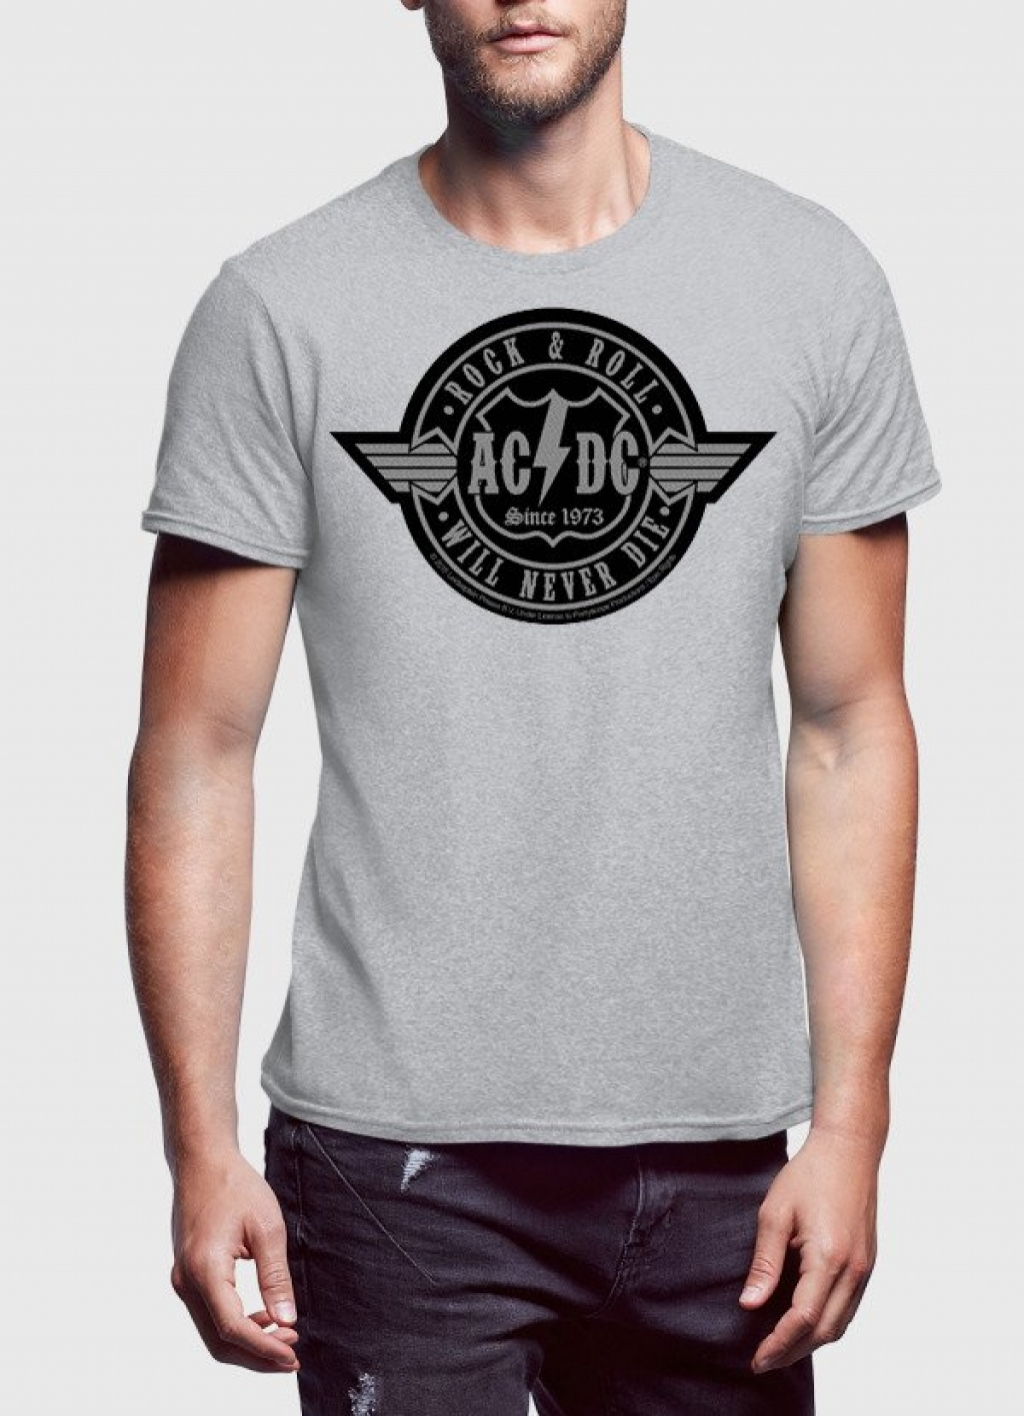 14964185590_ACDC_Back_In_Metal_Grey_Half_Sleeve_Men_T-Shirt-grey.jpg